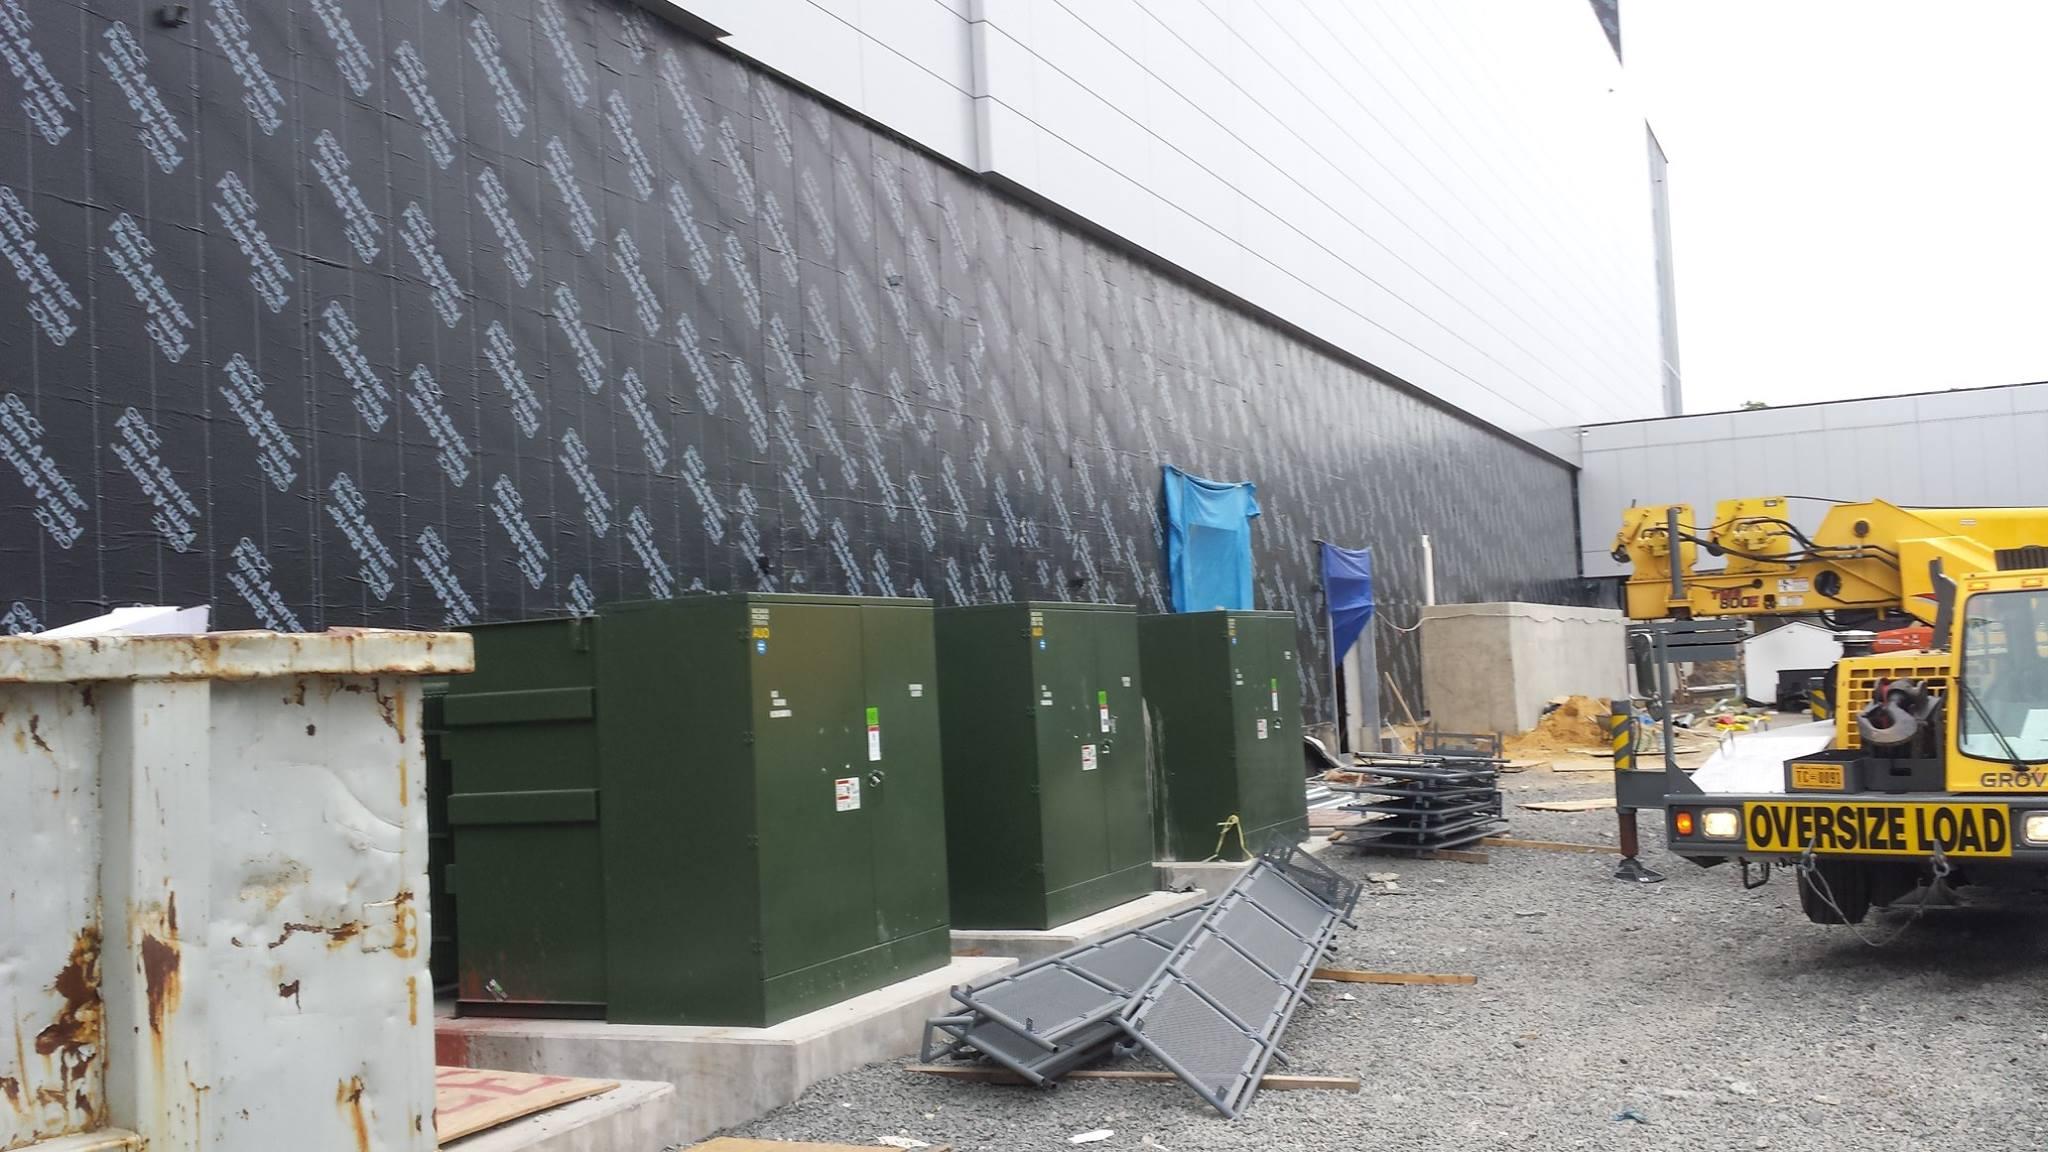 Bradleigh Applications, Inc. construction at Coresite (Polymer-Based EIFS - Sheet Metal Flashing & Trim - Joint Sealants)